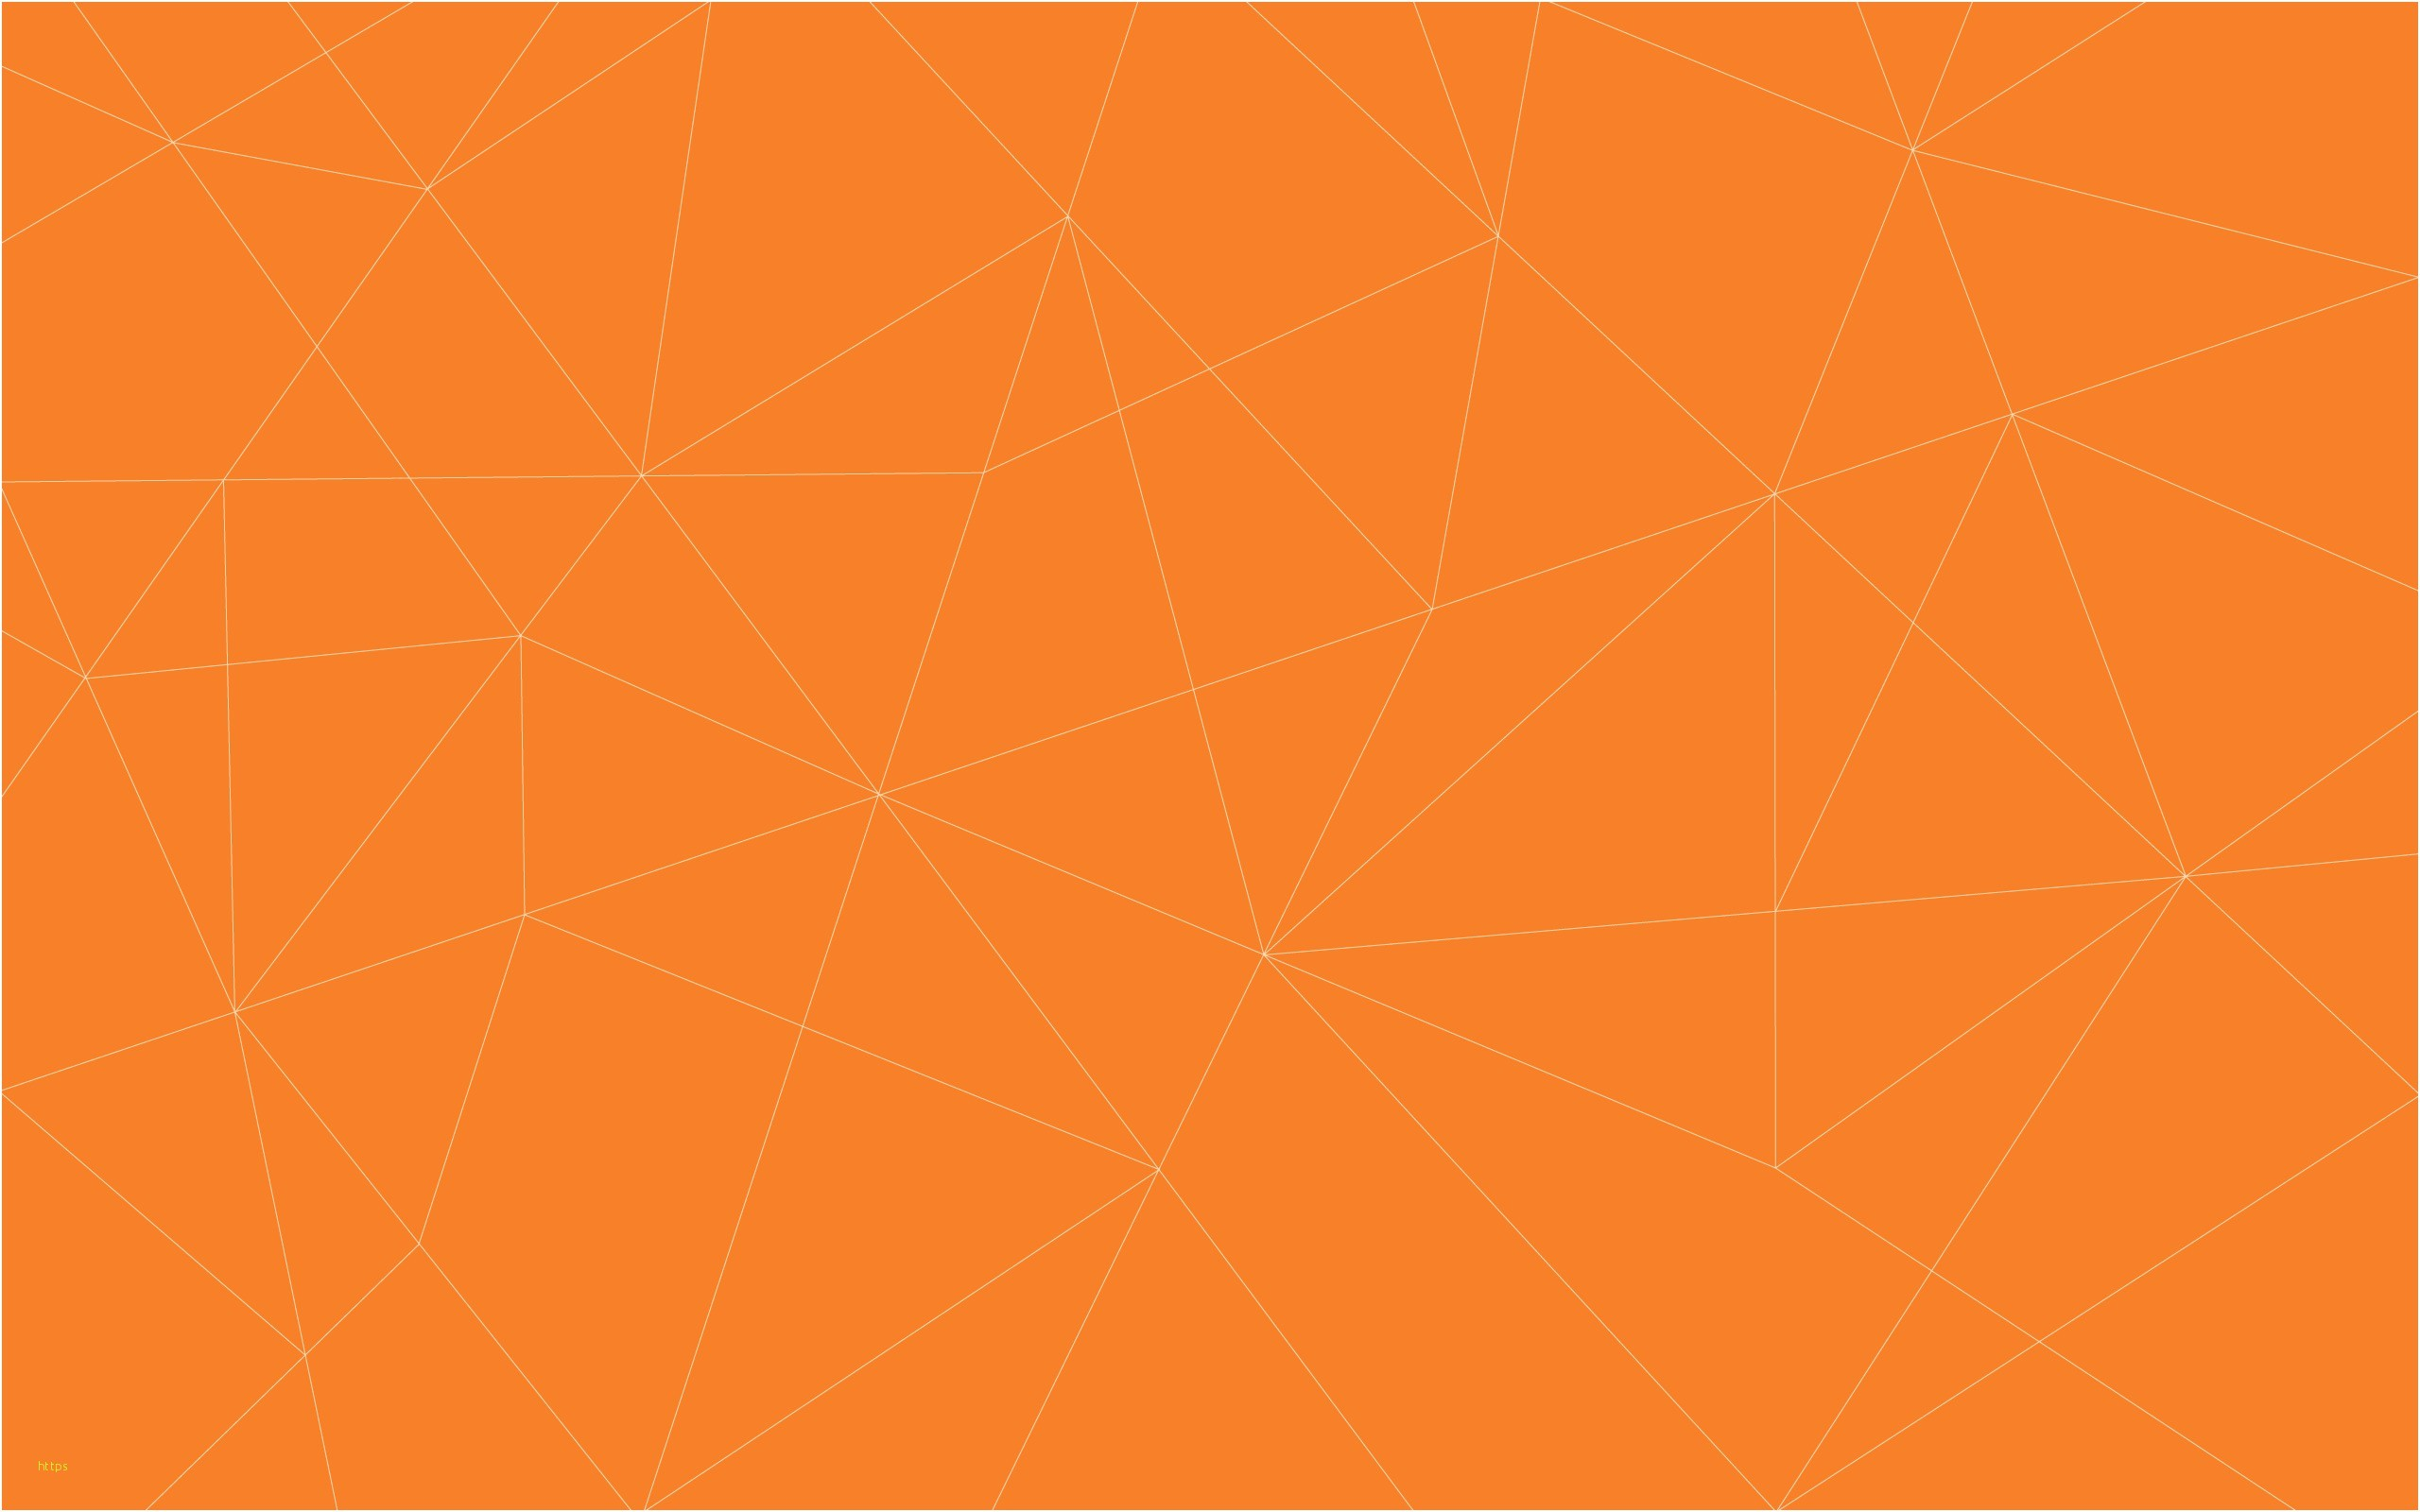 1519234 orange geometric wallpaper 2560x1600 for macbook